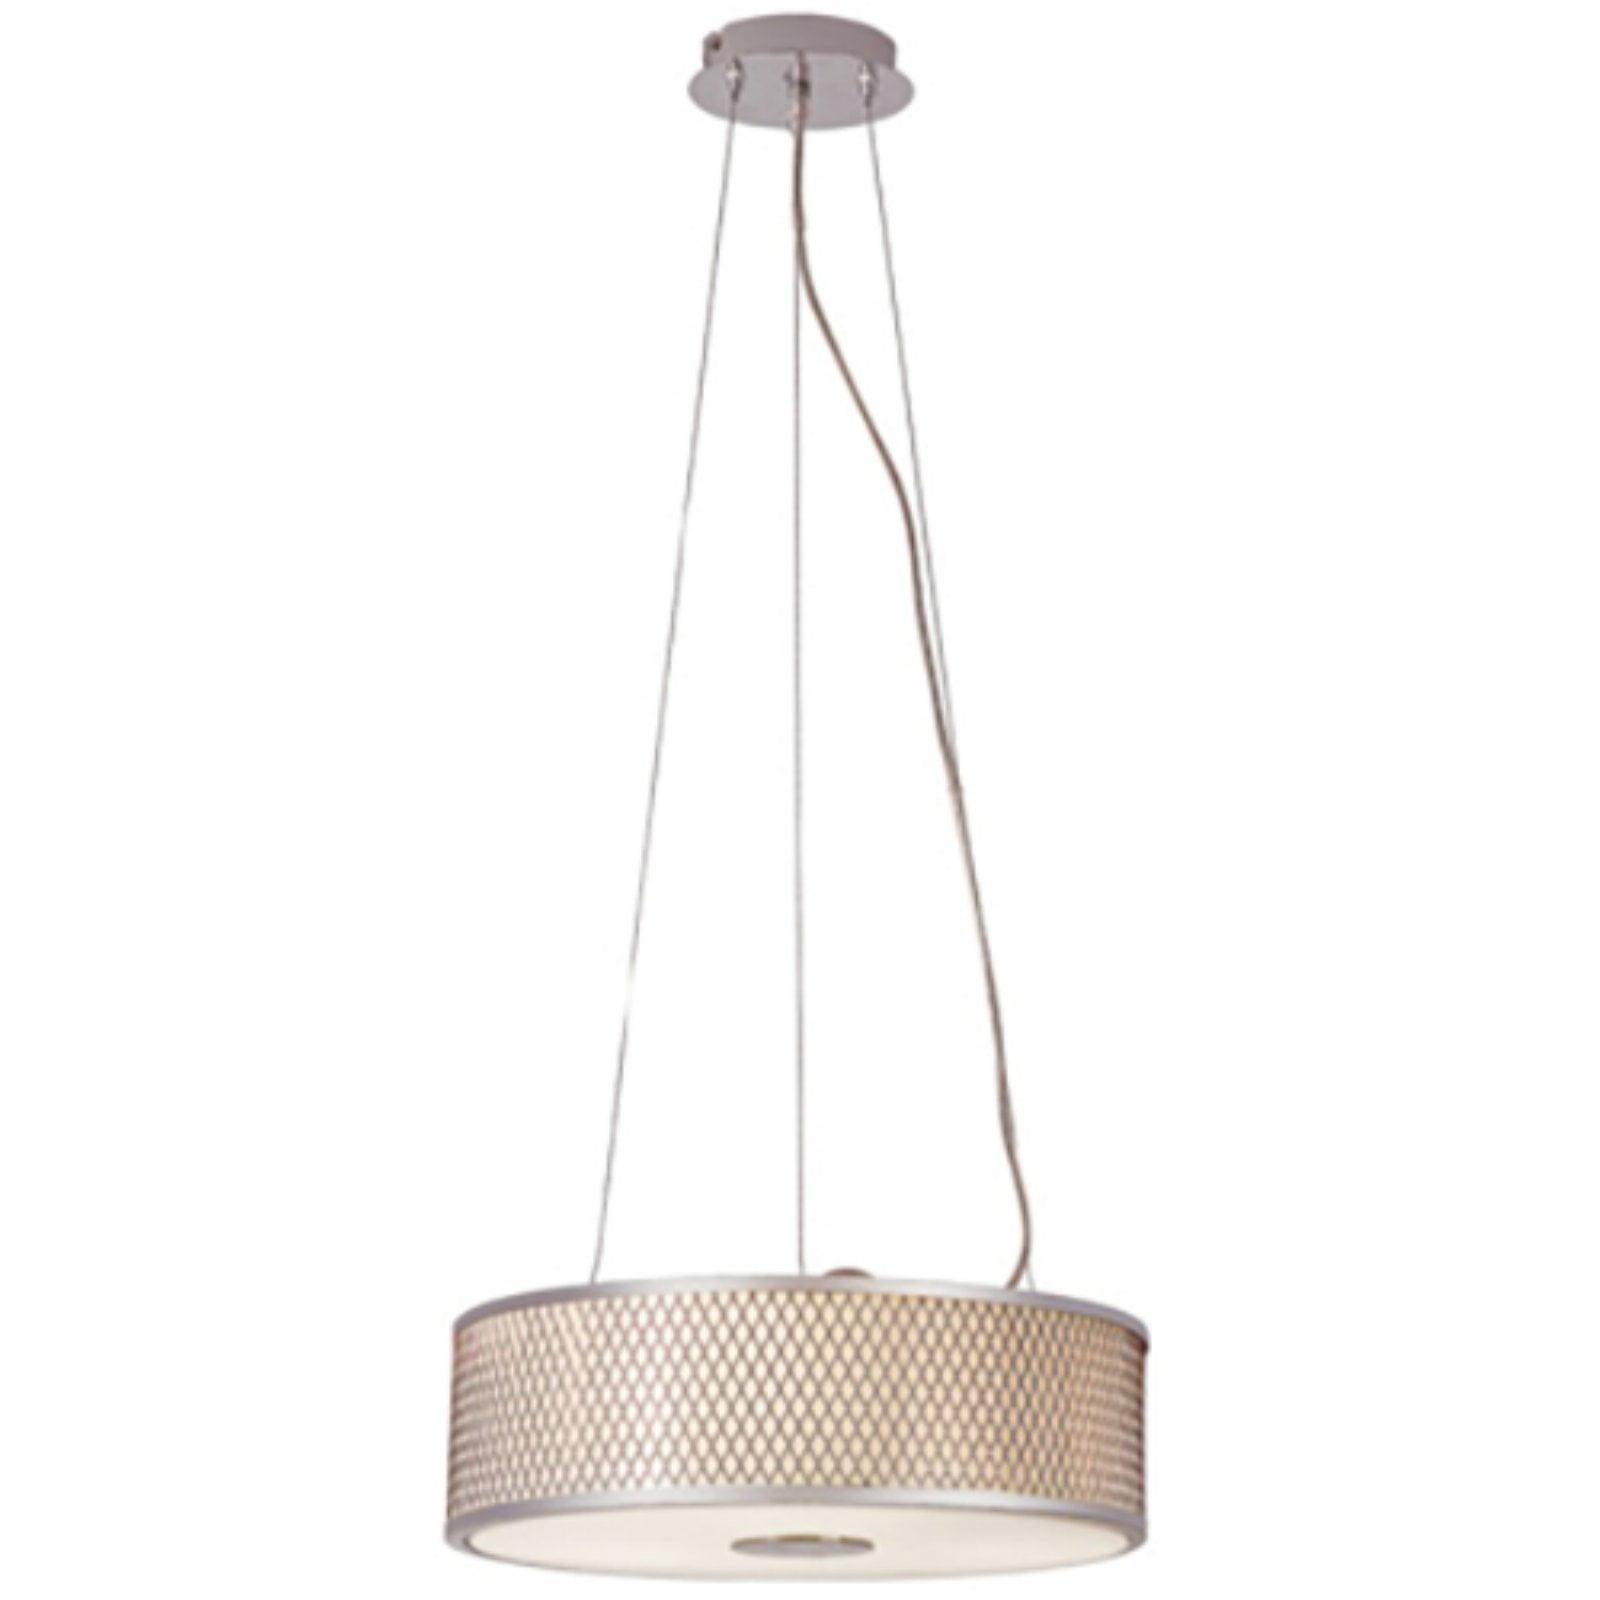 Trans Globe Lighting Cardiff 10143 PC Pendant Light